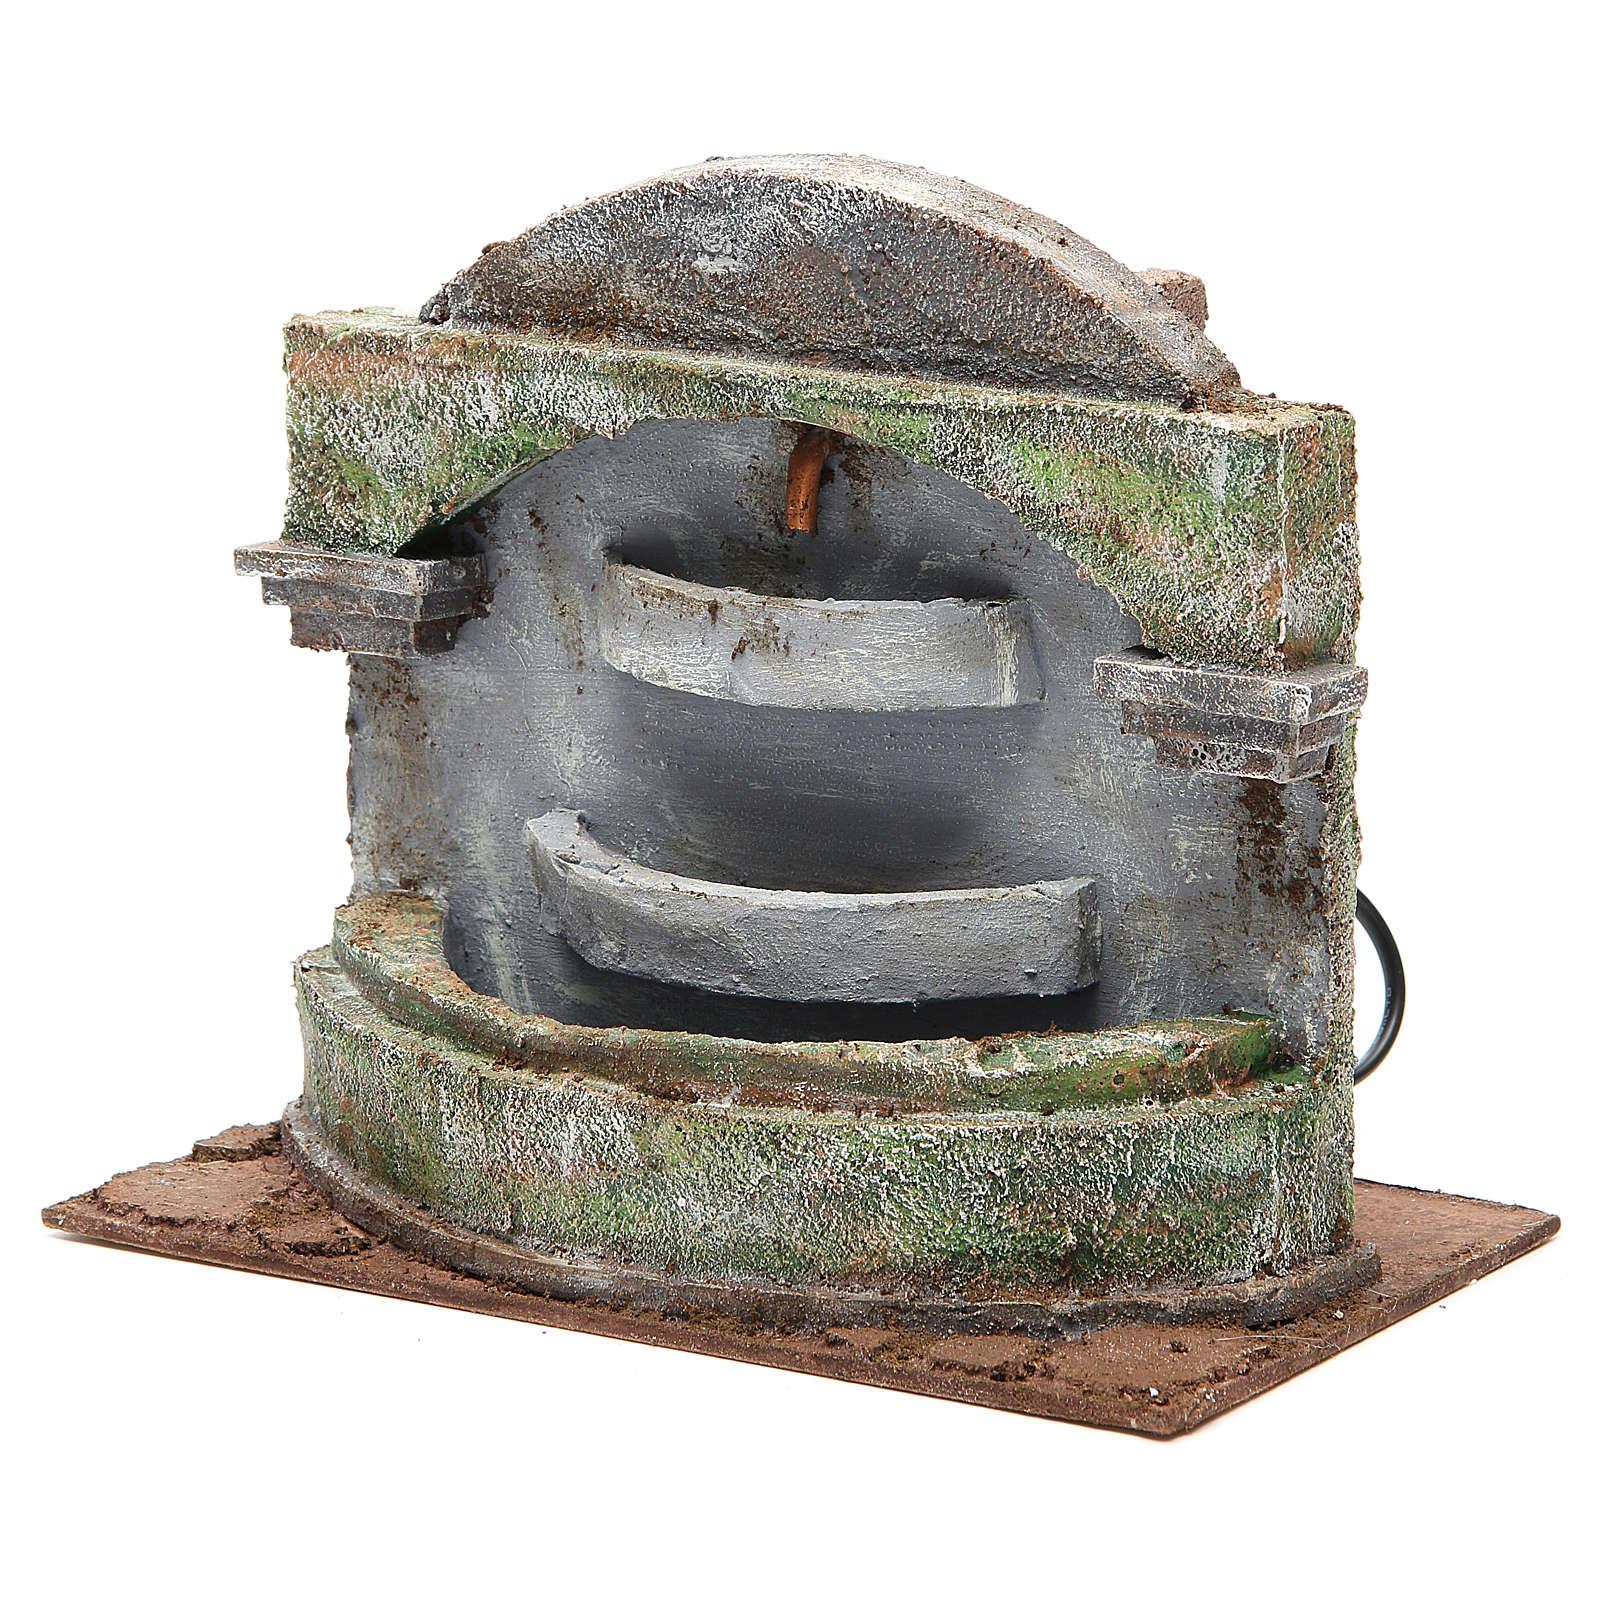 Fontana presepe con effetto cascata 3 vasche 20x25x15 cm 4